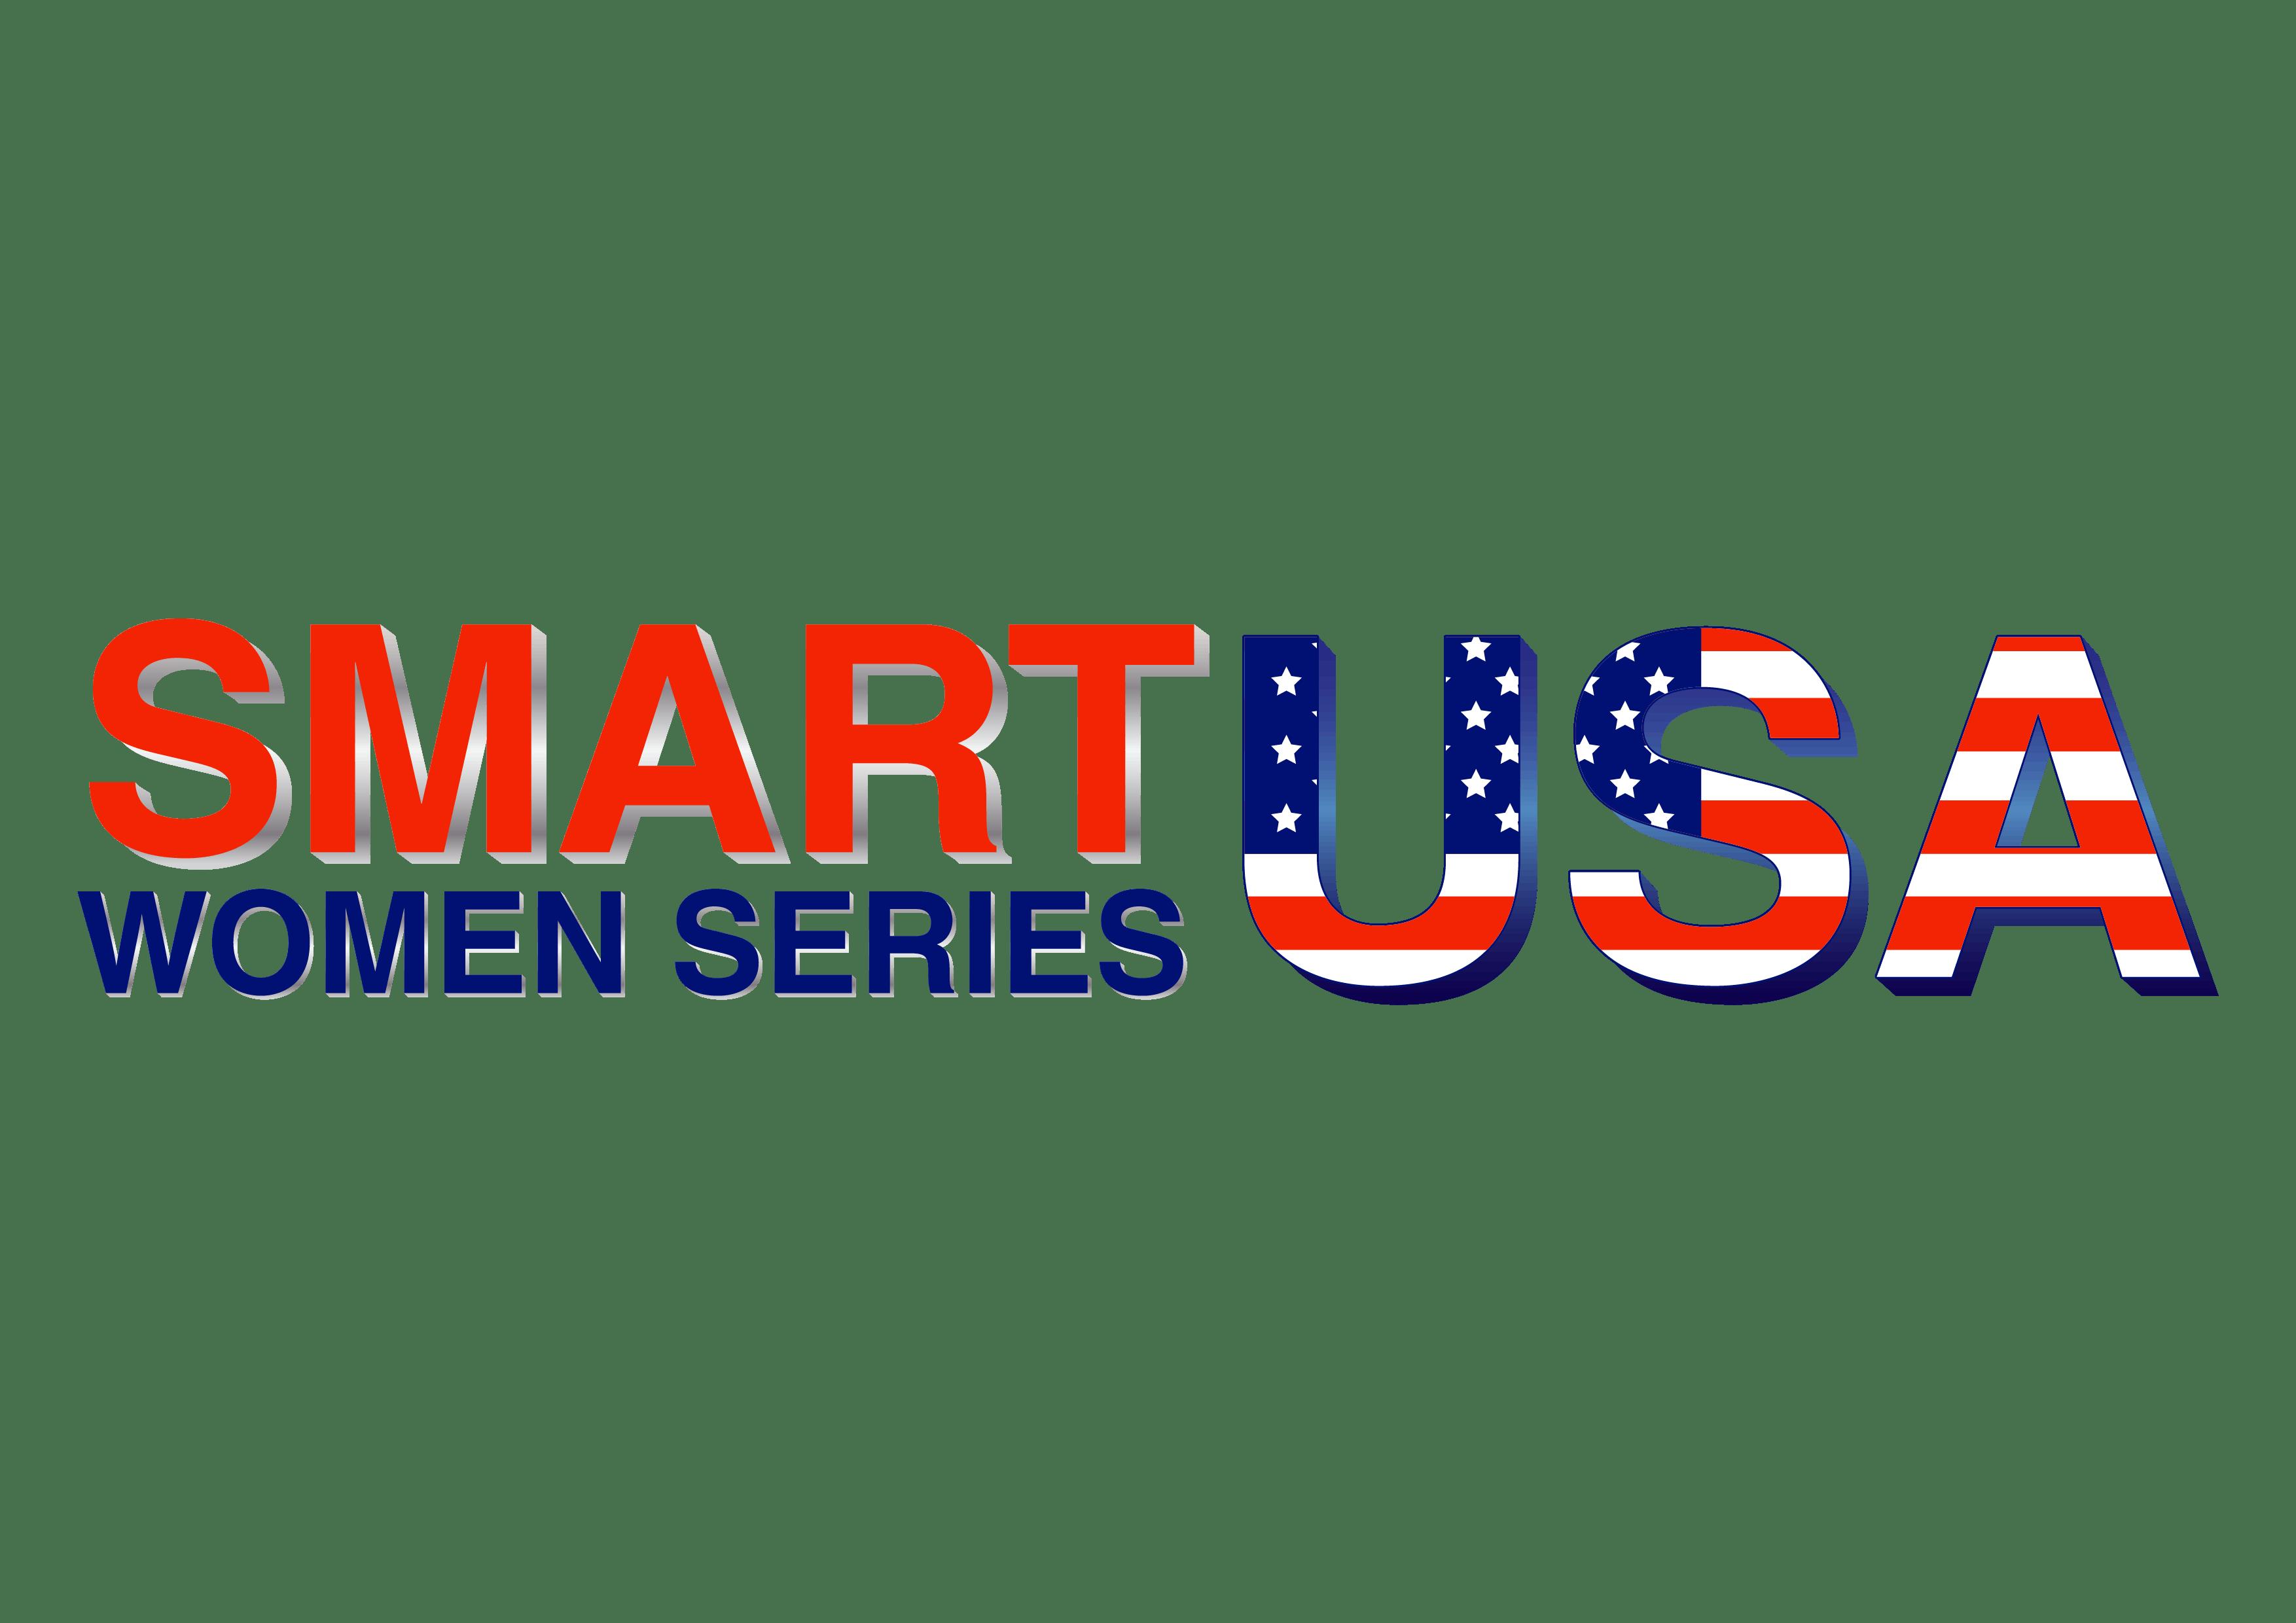 Smart Women Series